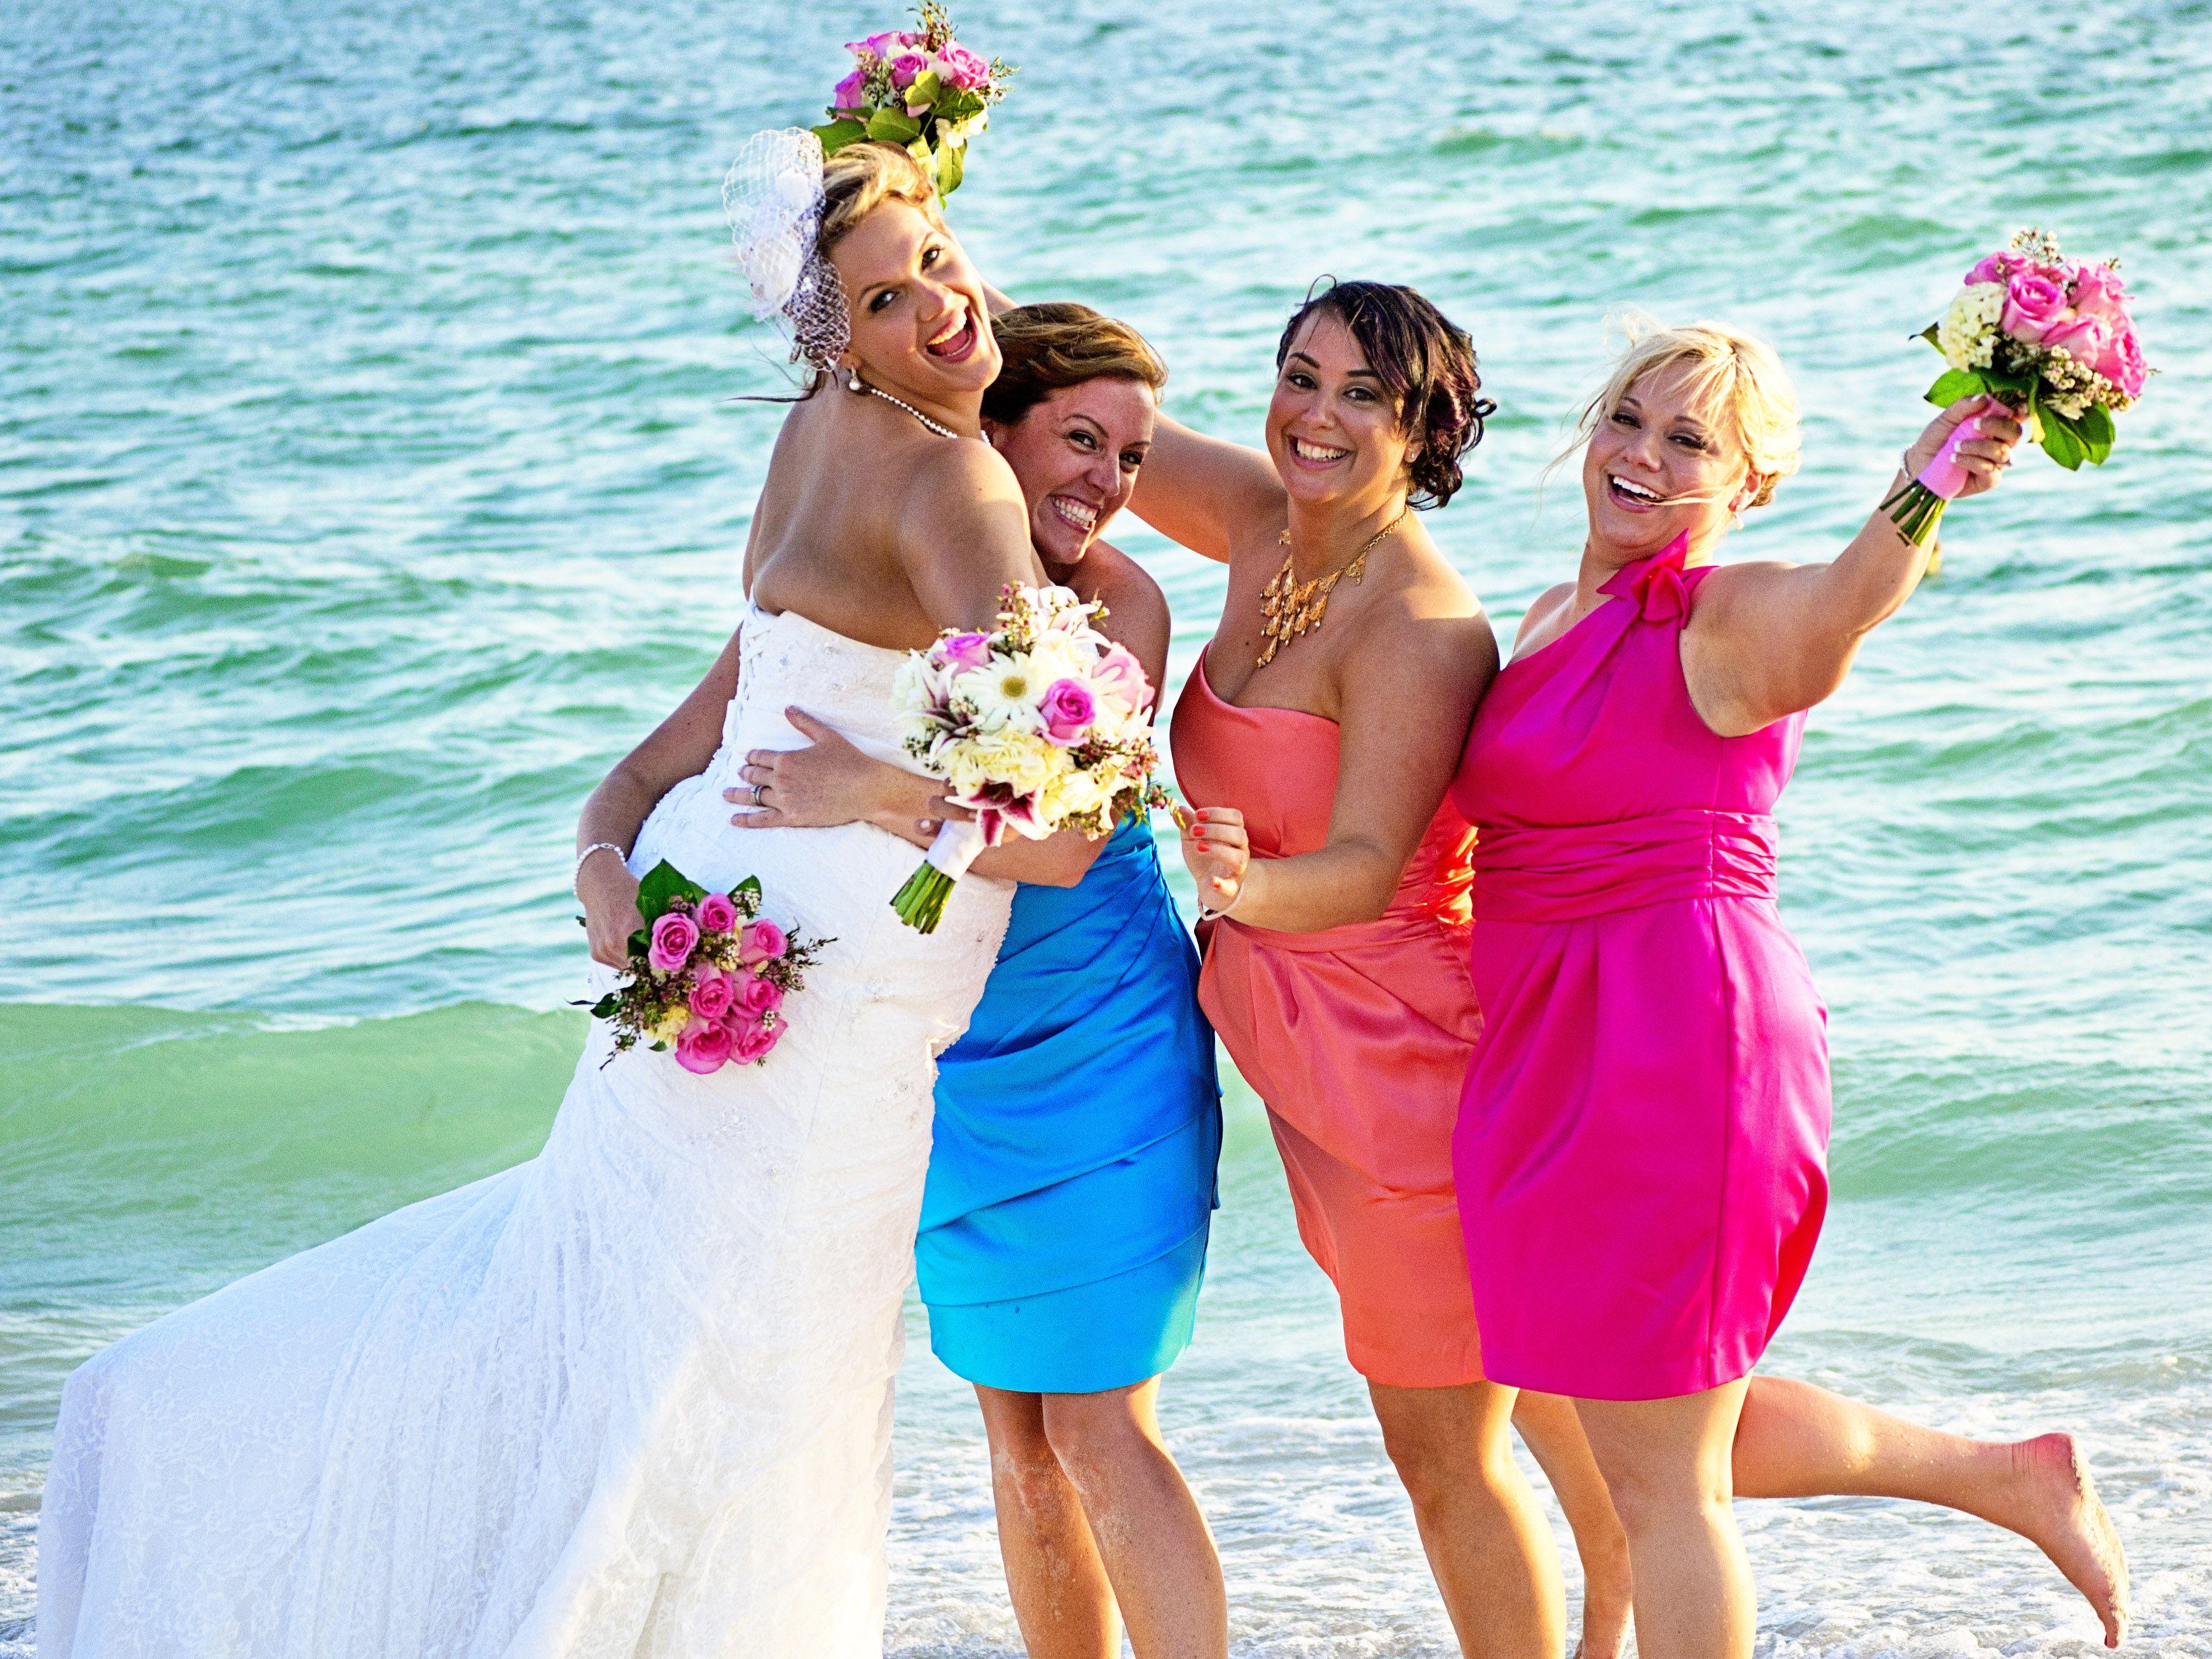 Beach wedding multicolor bridesmaids dresses. Adds a